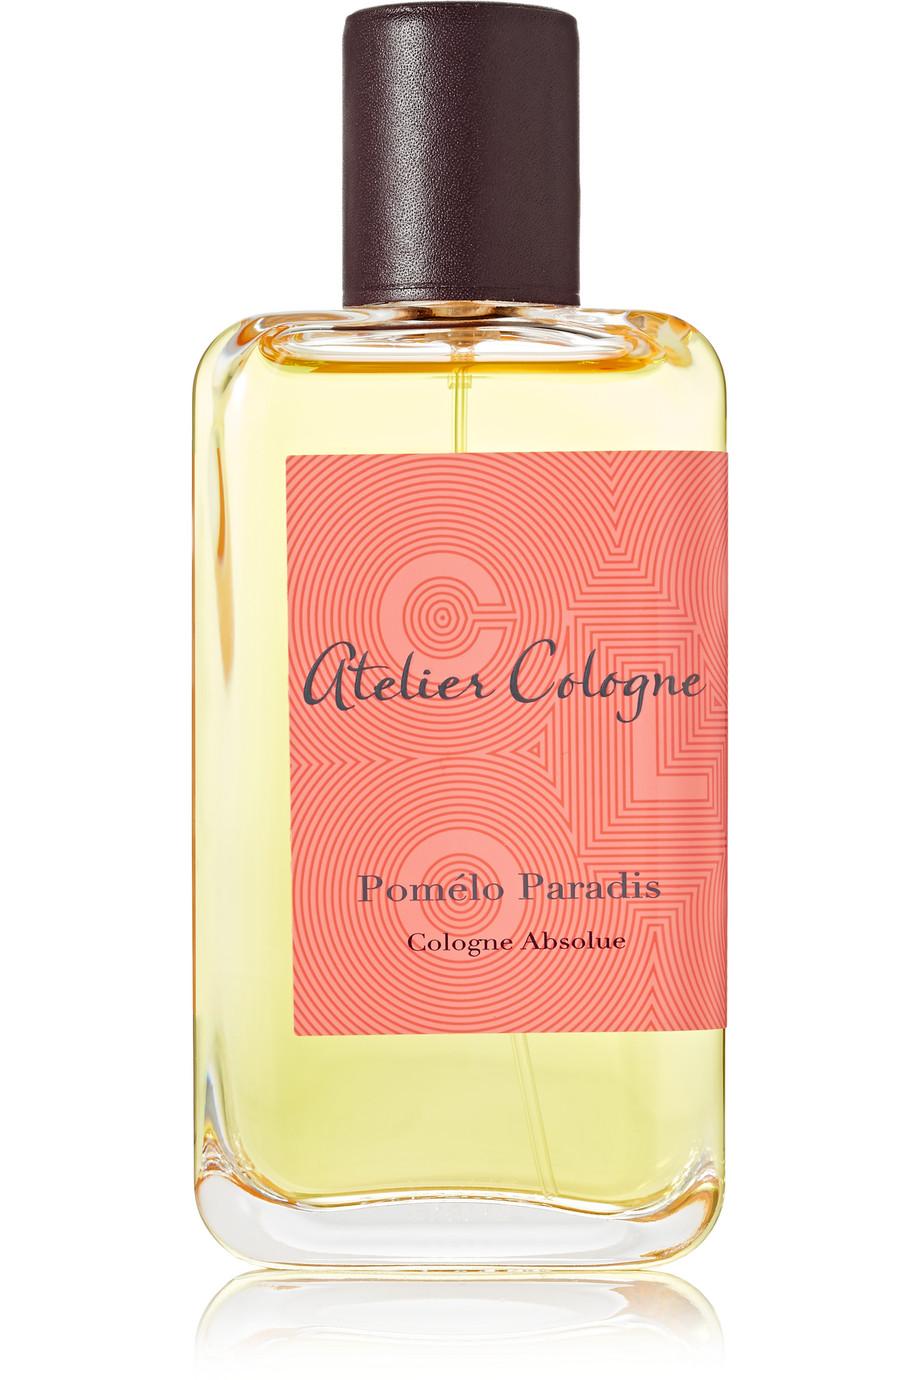 Cologne Absolue - Pomélo Paradis, 100ml